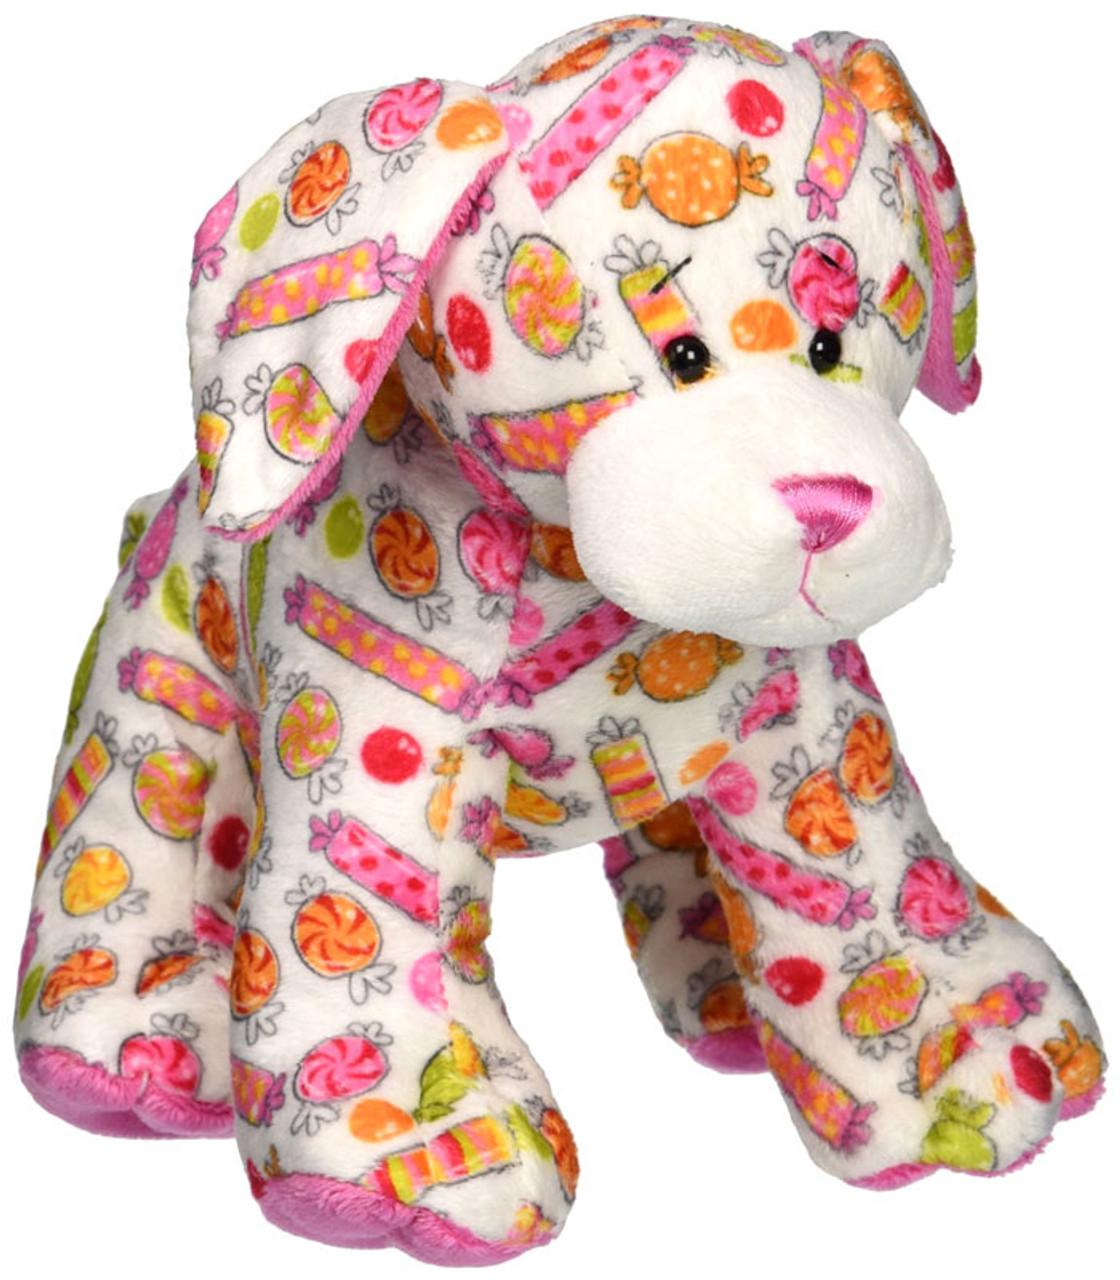 Webkinz Candy Pup Plush